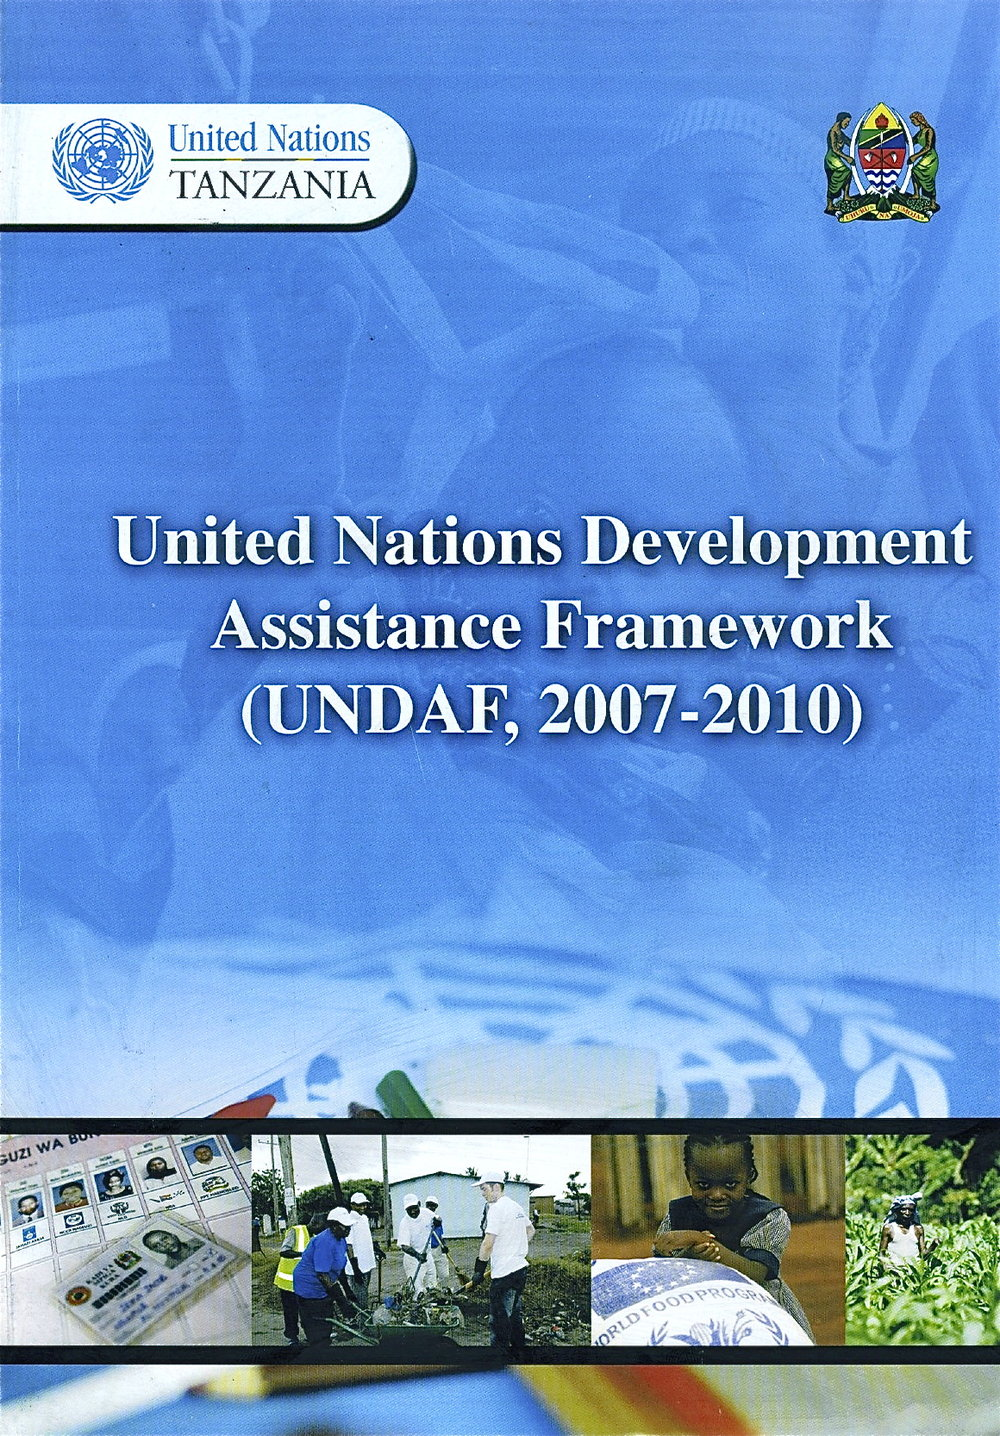 United Nations Development Assistance Framework, 2007-10. Editor. (One UN, 2007)